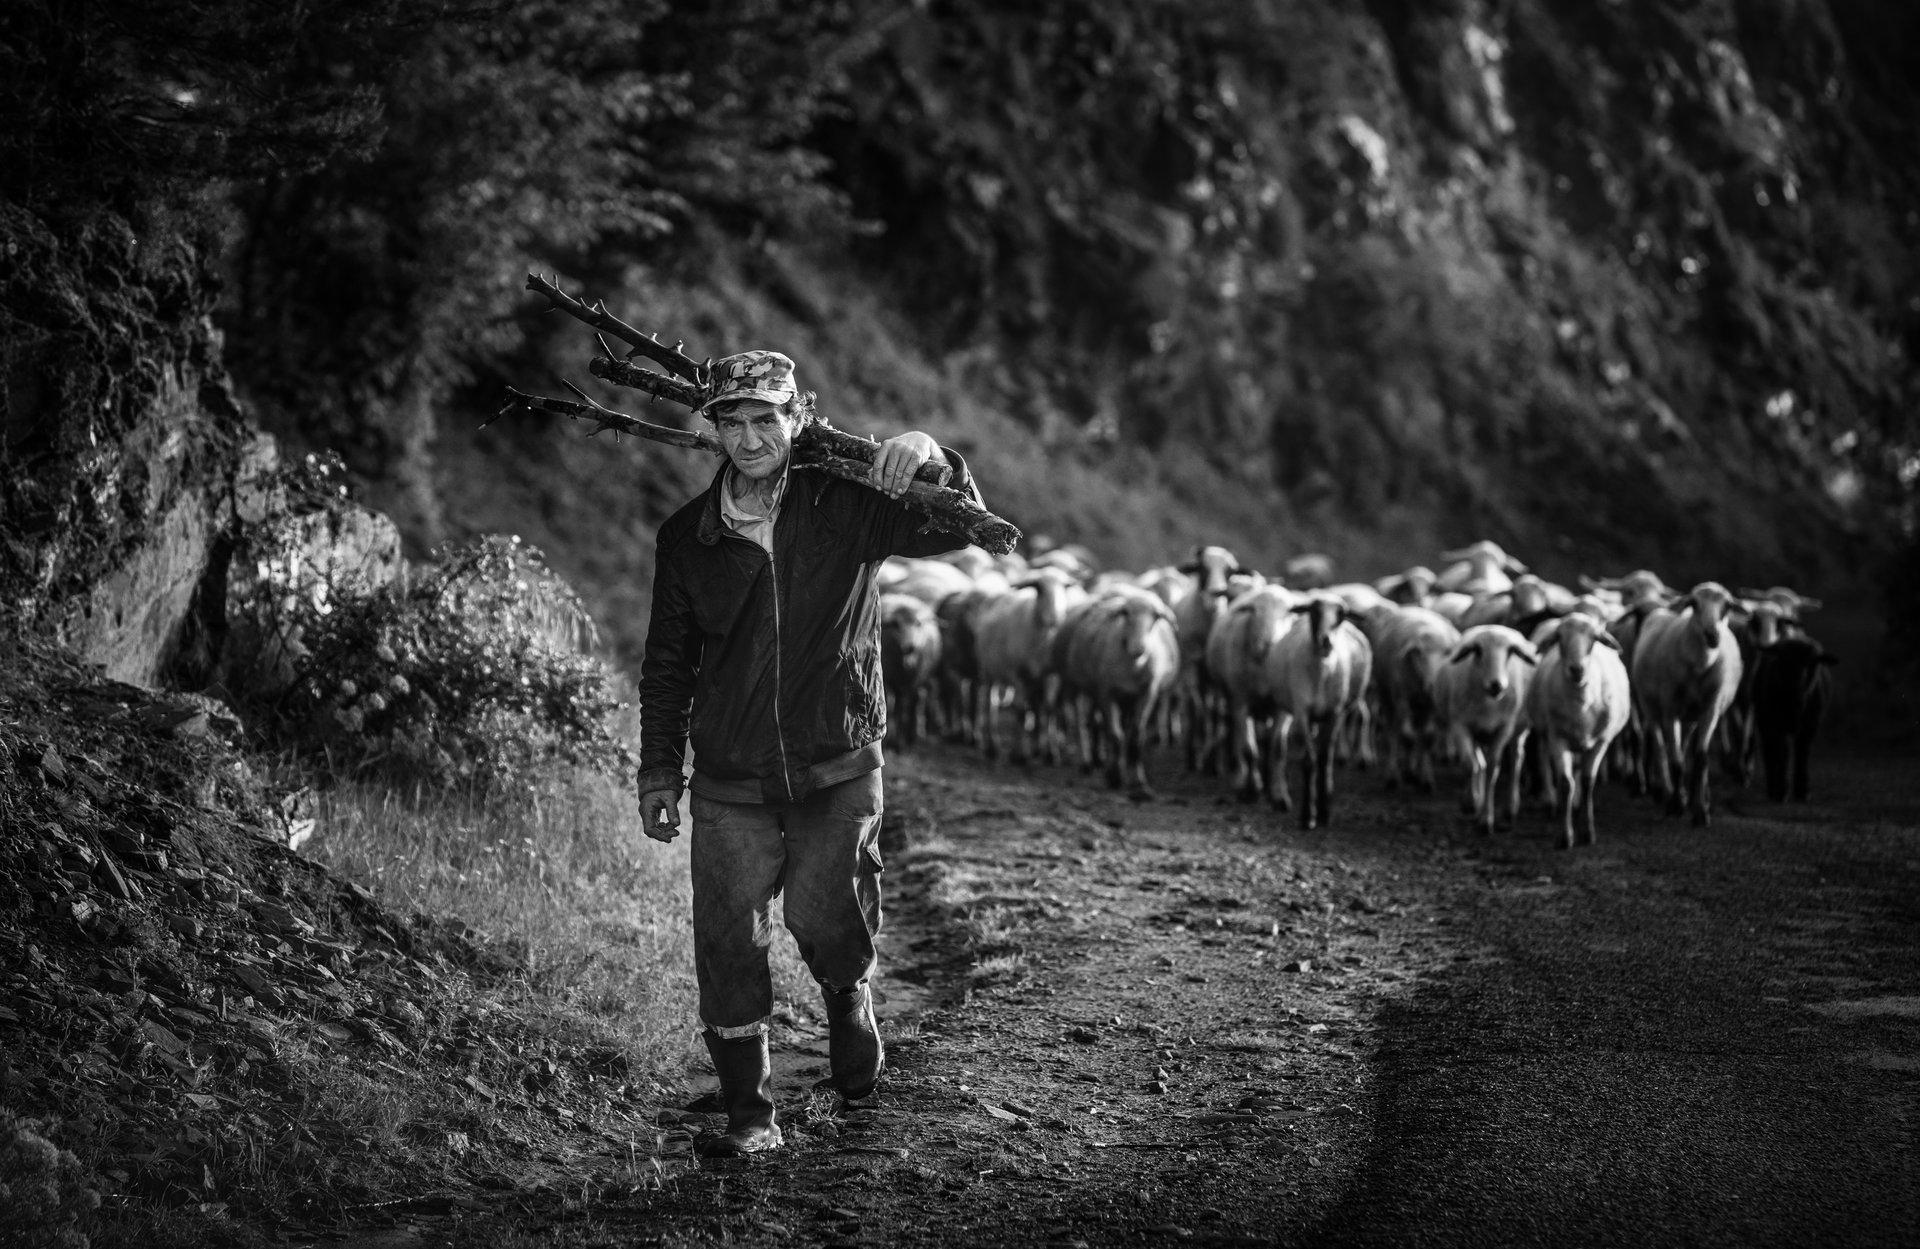 Един ден по-малко   Author Vladimir Karamazov - Vlado79   PHOTO FORUM